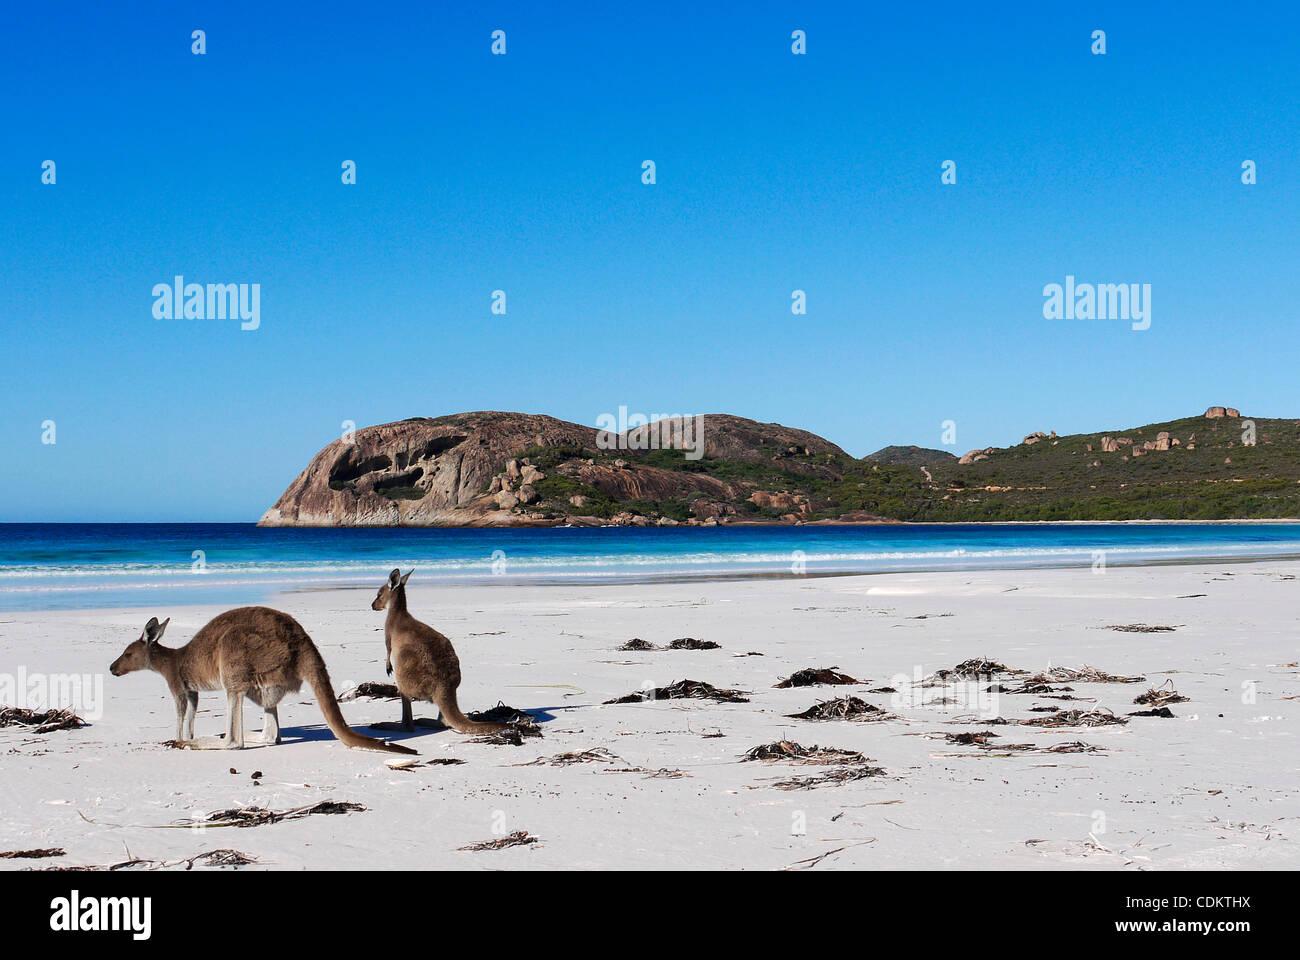 Mar 26, 2011 - Esperance, Western Australia, Australia - Two grey kangaroos sit on the beach at Lucky Bay in Cape Stock Photo